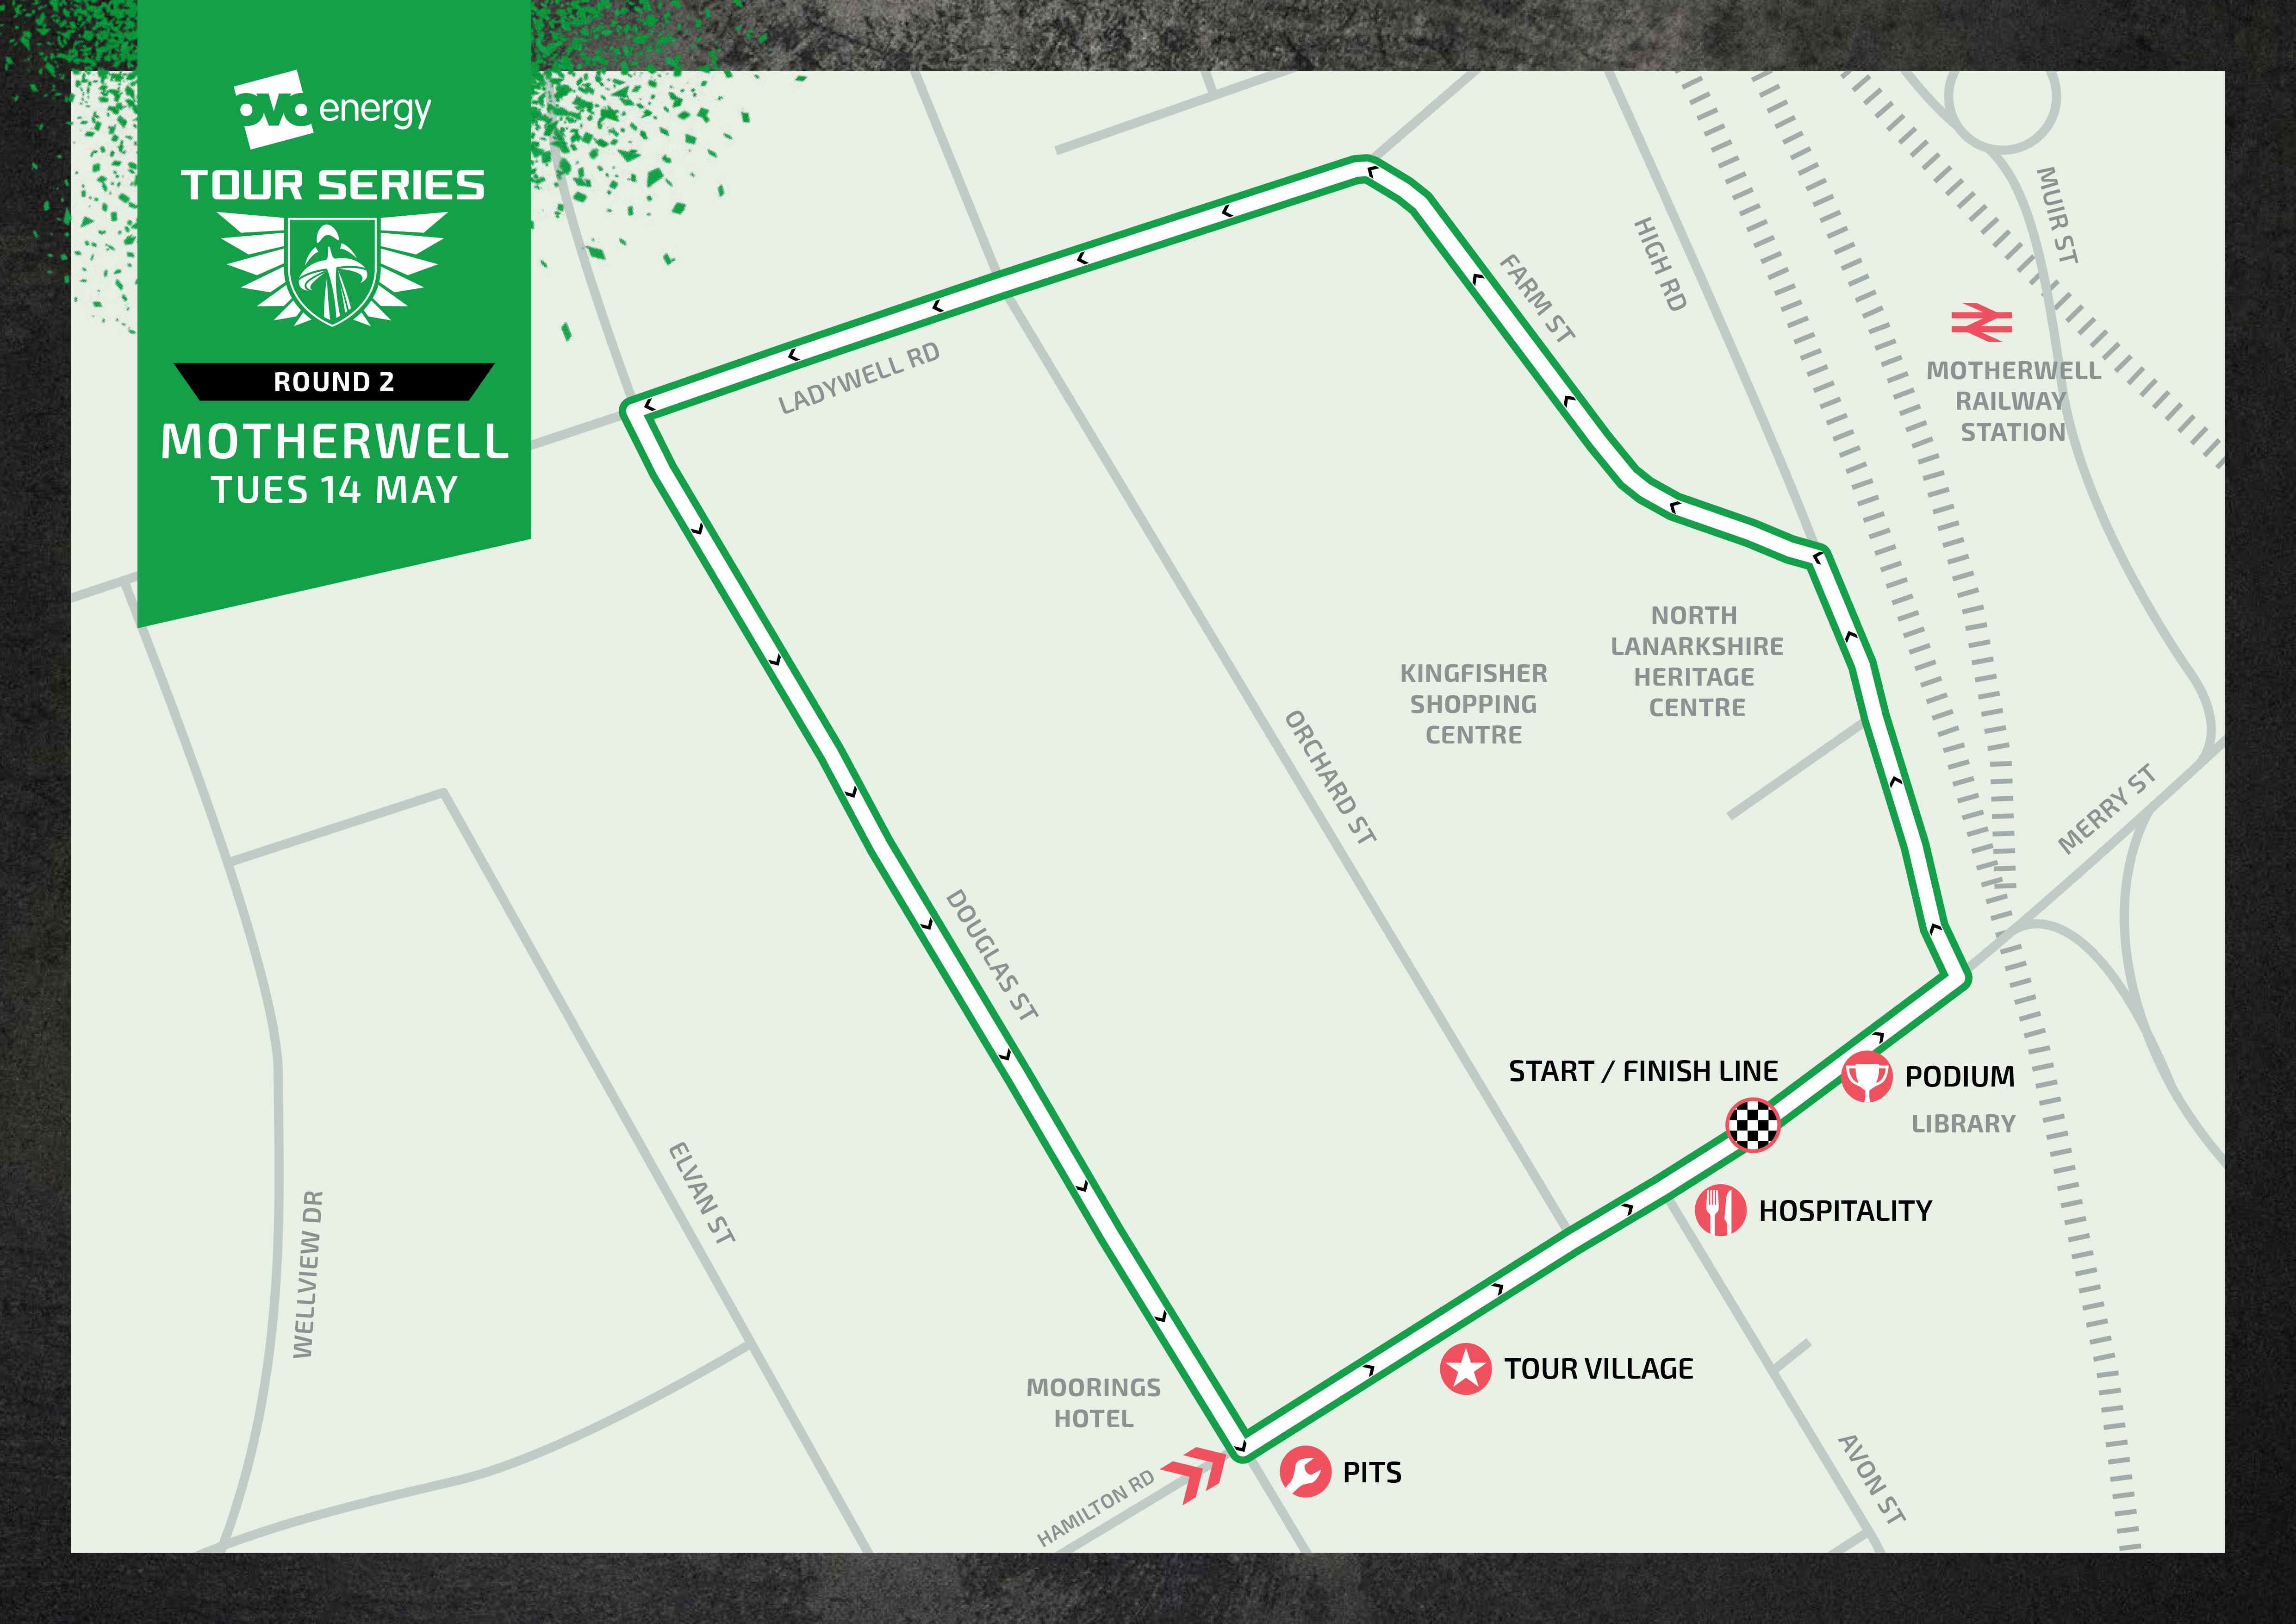 Motherwell Tour Series circuit